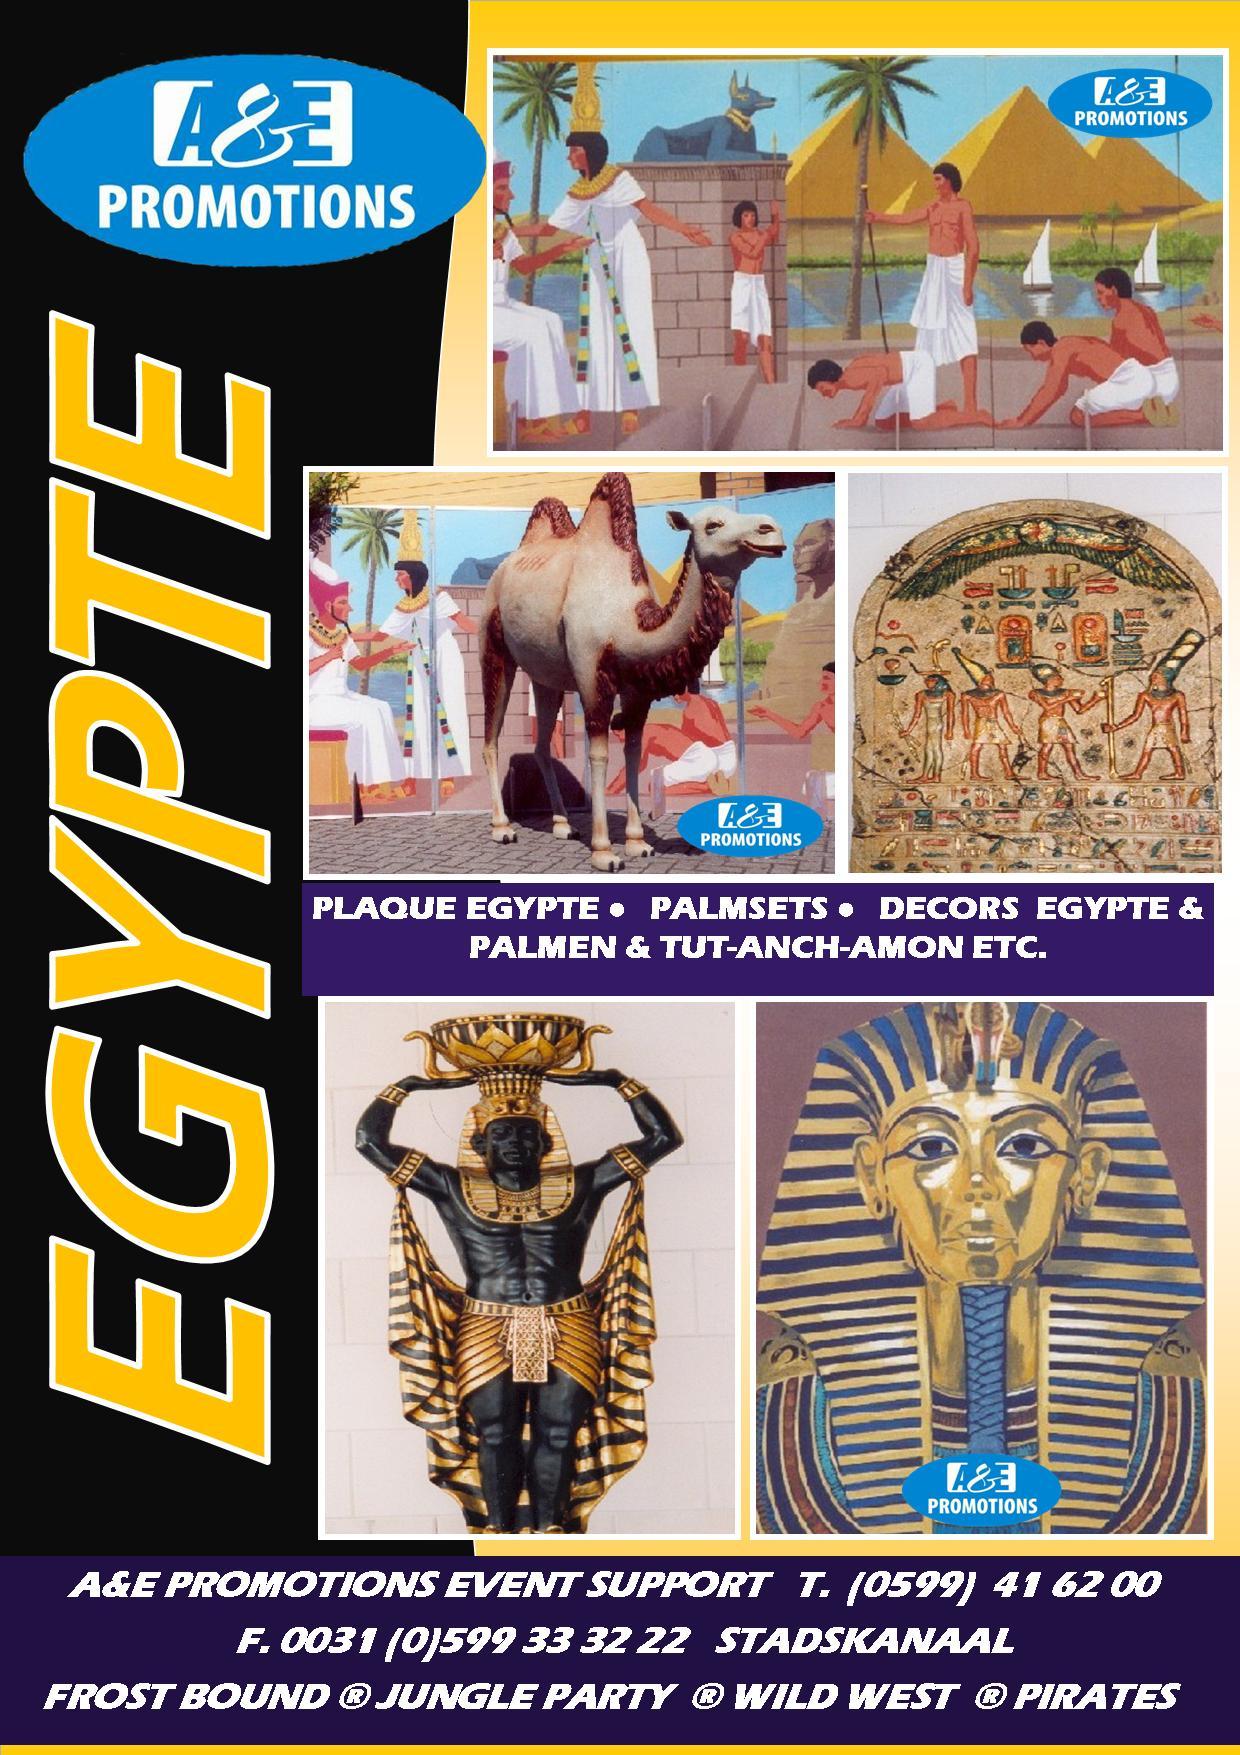 EGYPTE PROPS